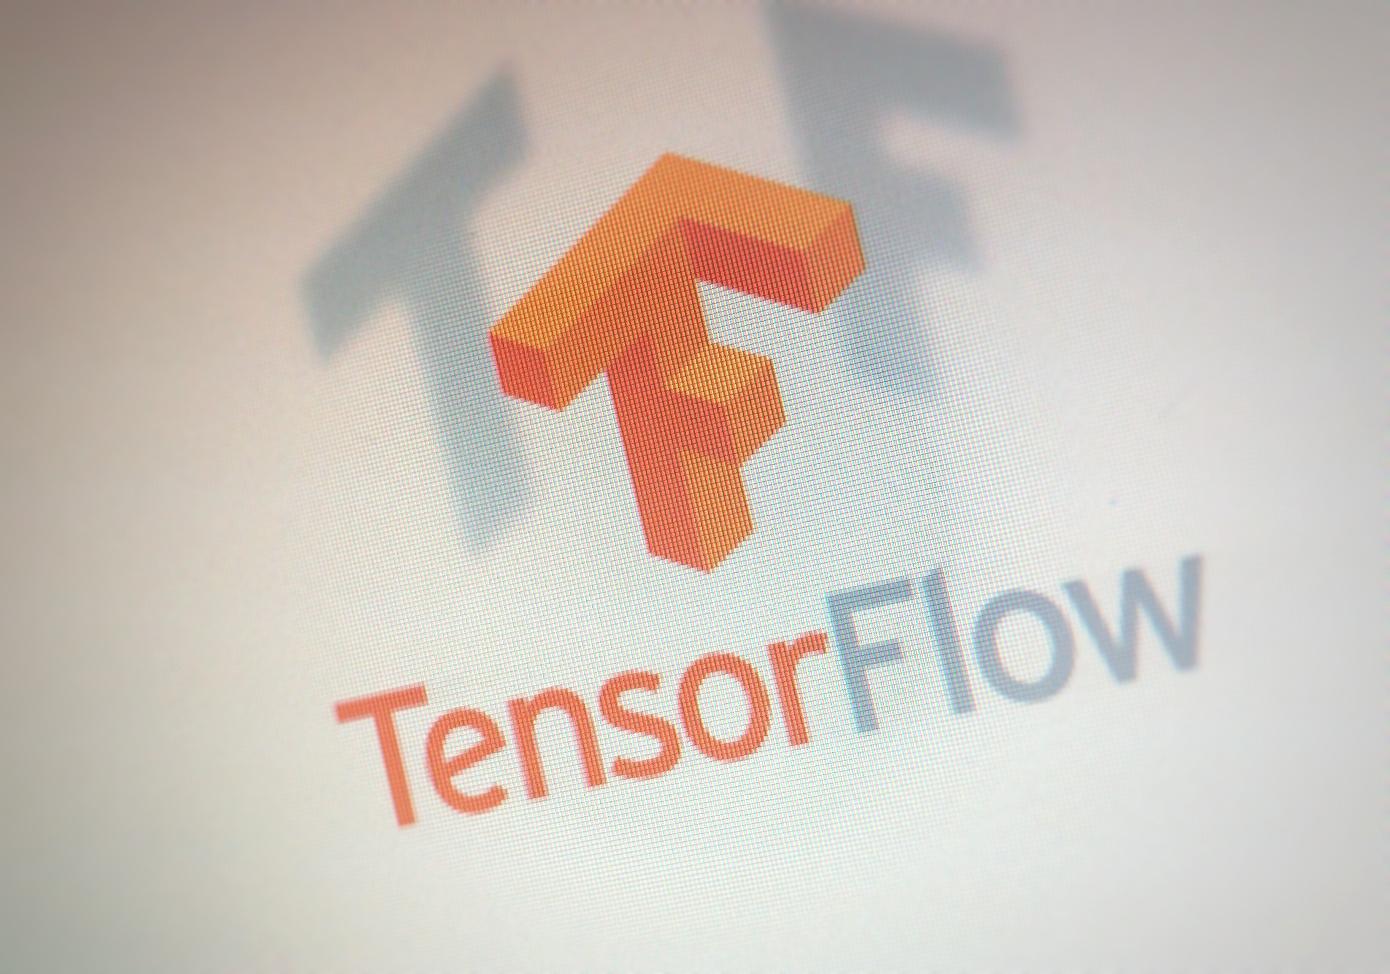 Google's TensorFlow AI framework adds Swift and JavaScript support